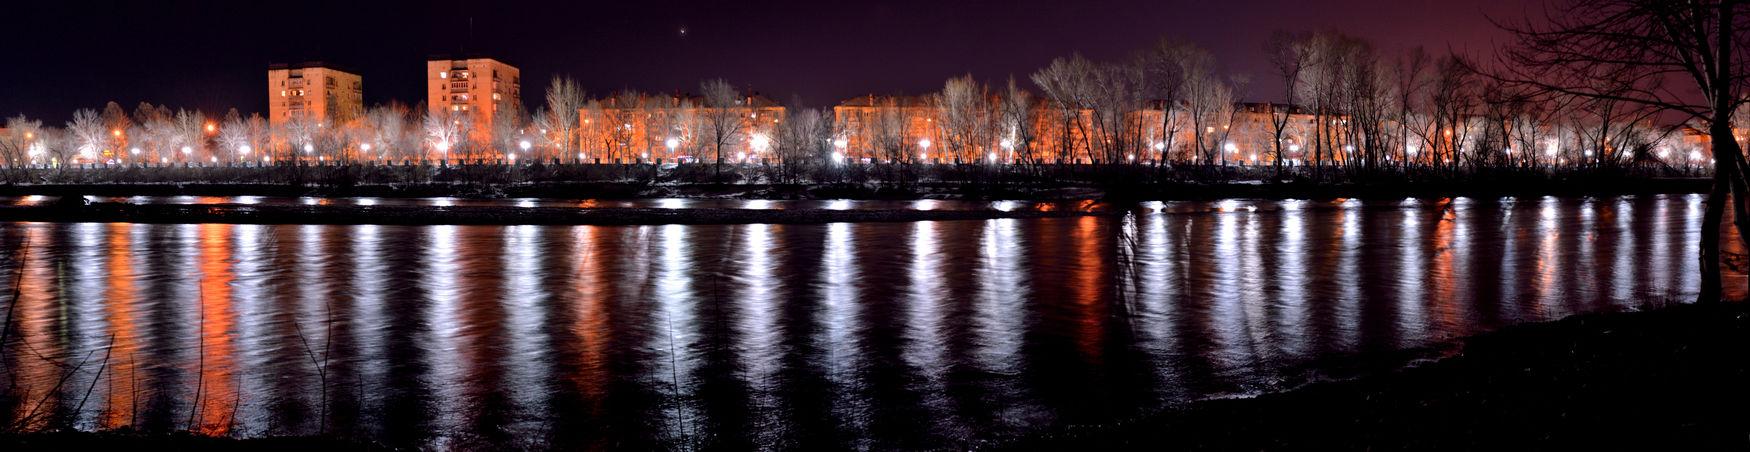 ulba river River Panoramic Photography Night River D610 Long Exposure Illuminated Reflection Sky